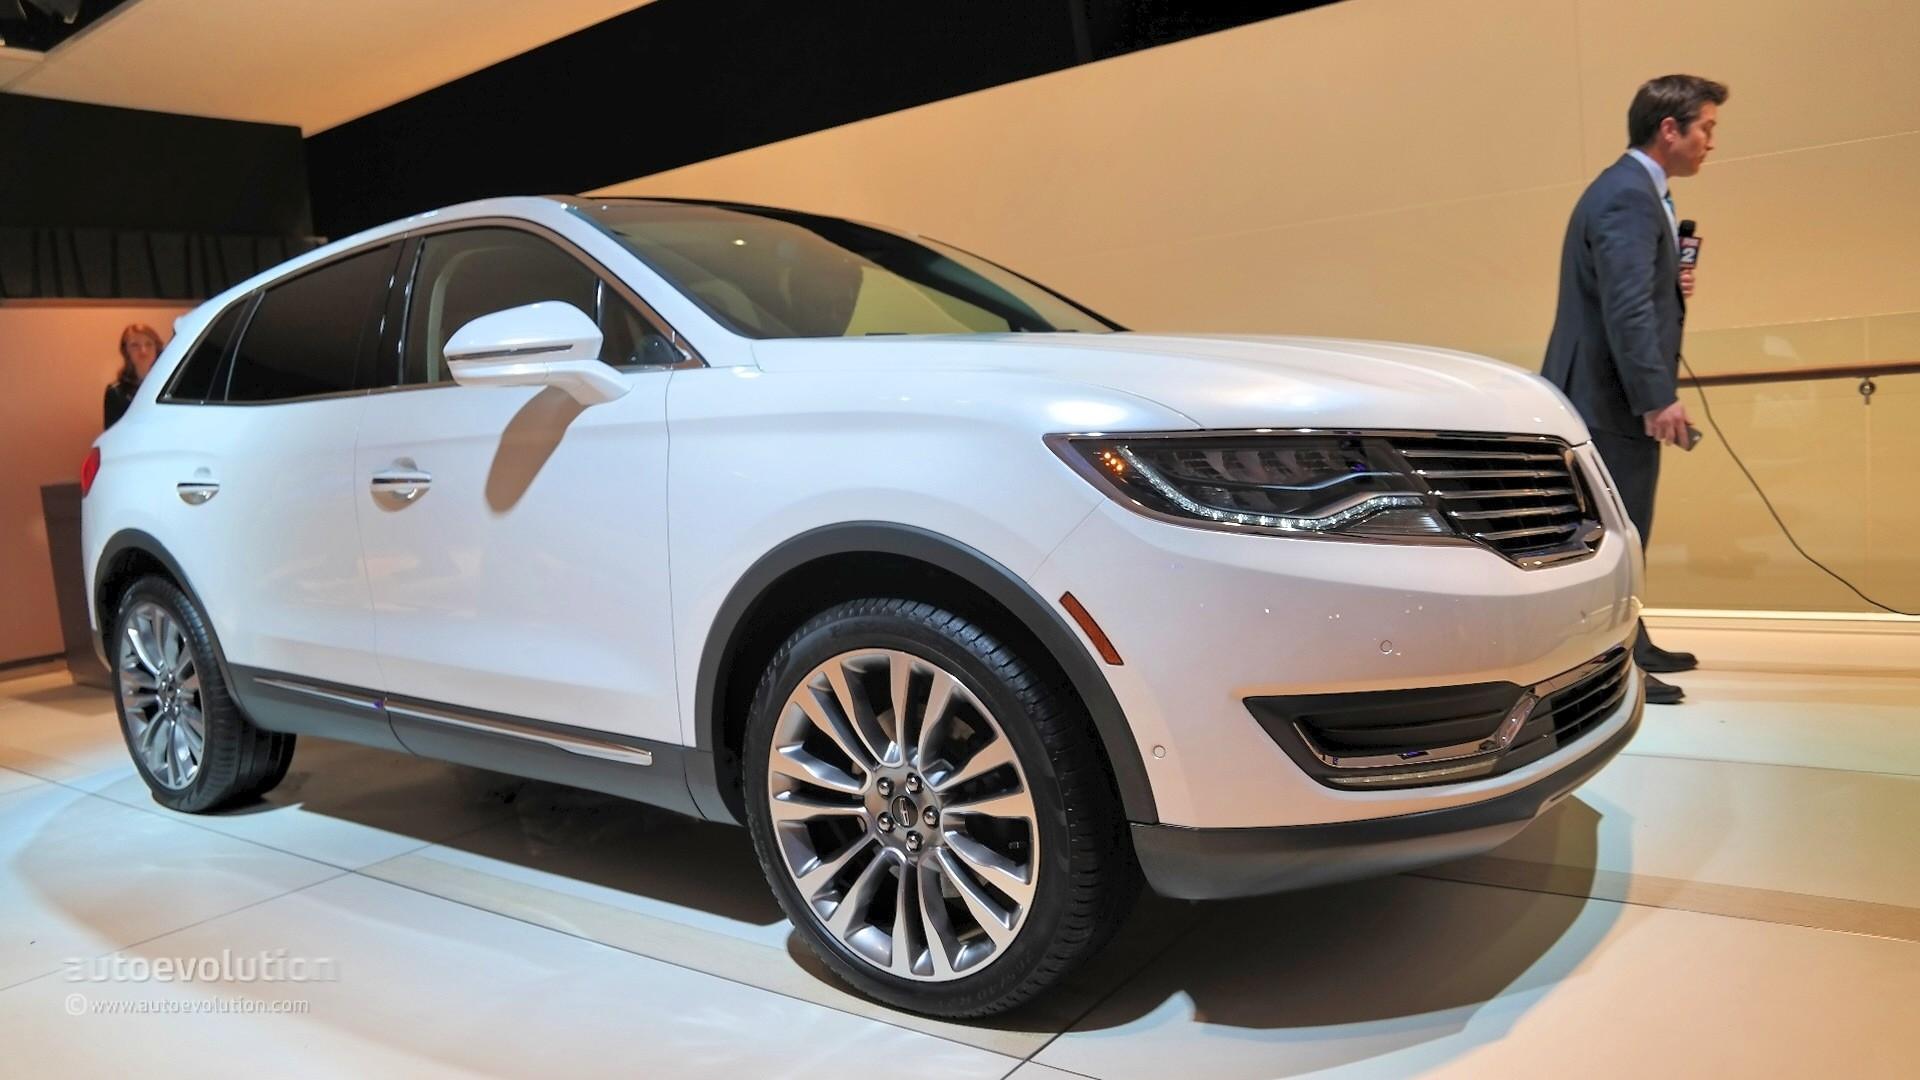 2016 Lincoln MKX Makes World Debut at NAIAS, It's a ...